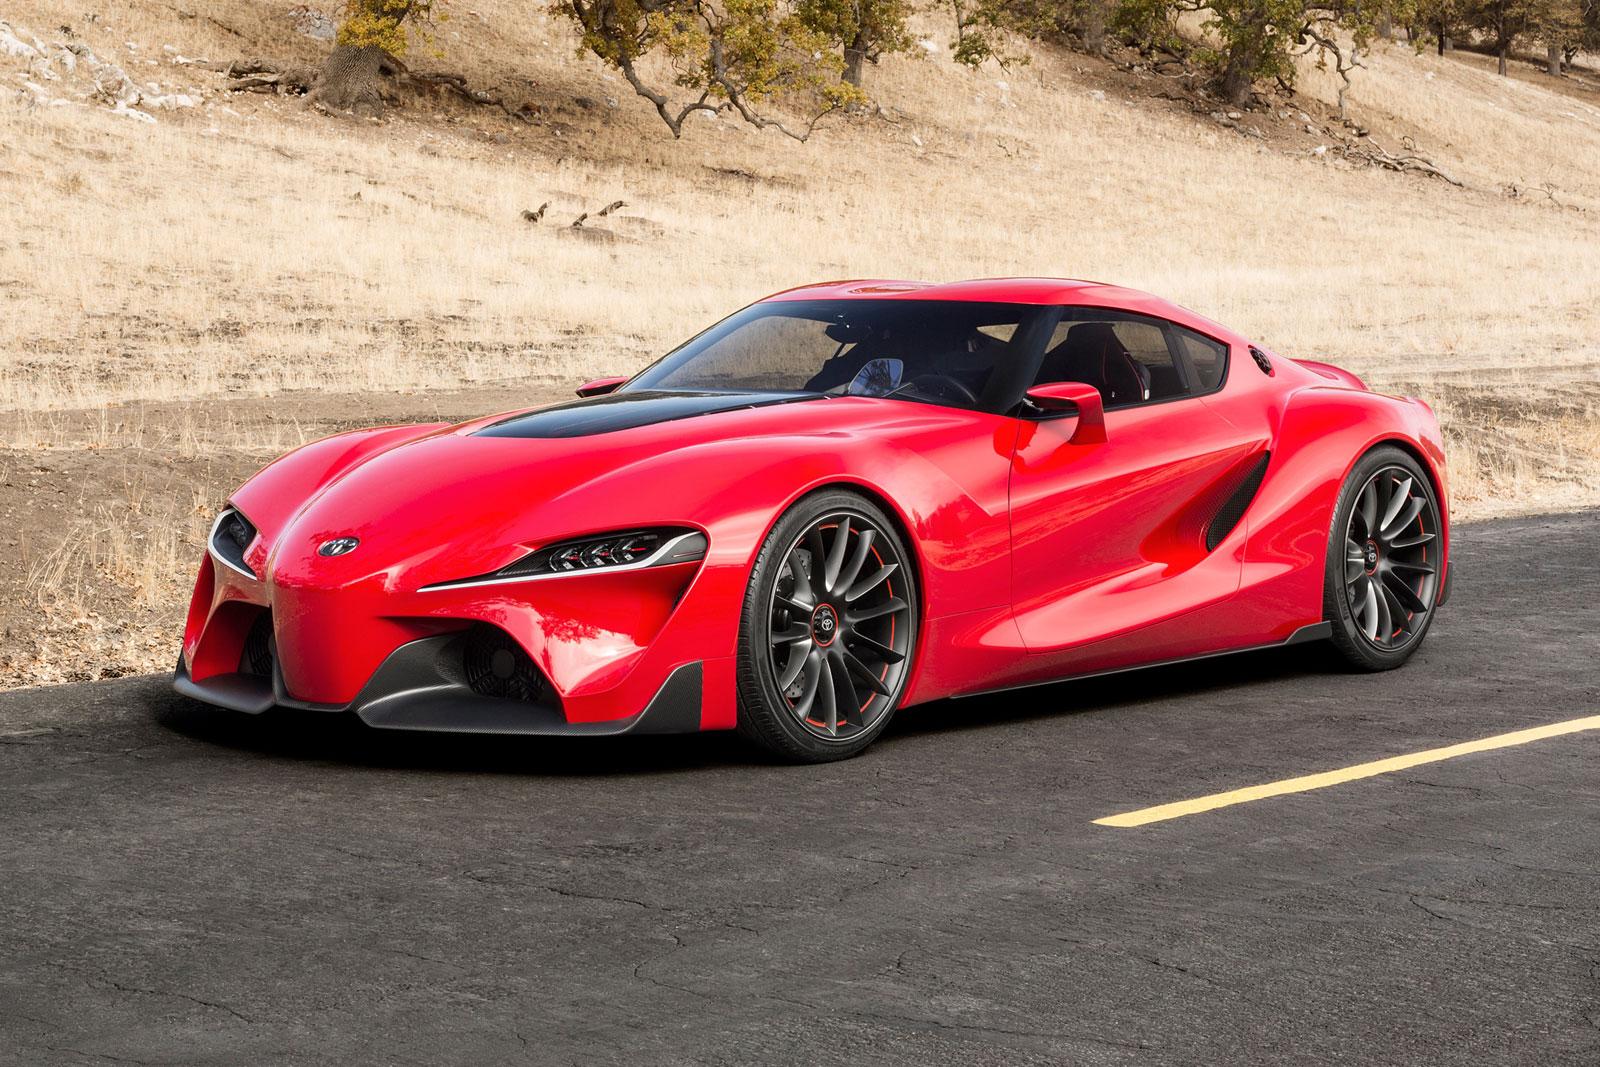 Toyota Ft 1 >> Toyota Ft 1 Concept Car Body Design